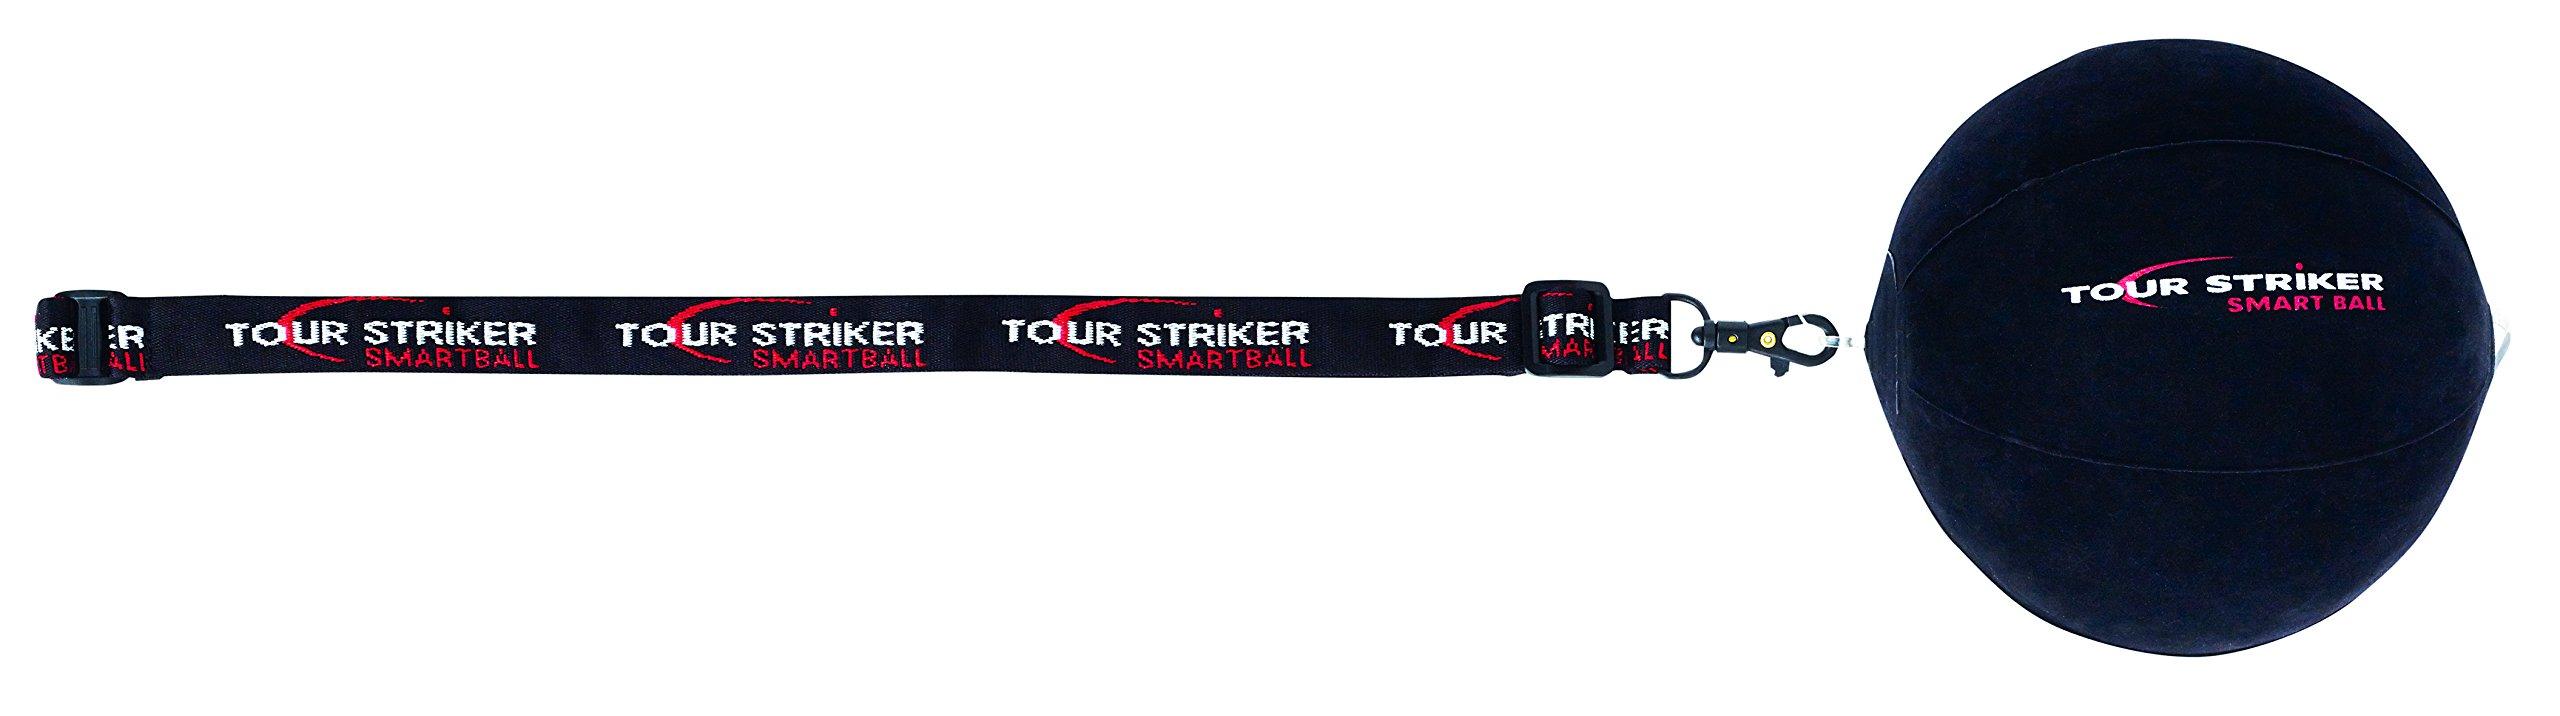 Tour Striker Smart Ball by Tour Striker Inc